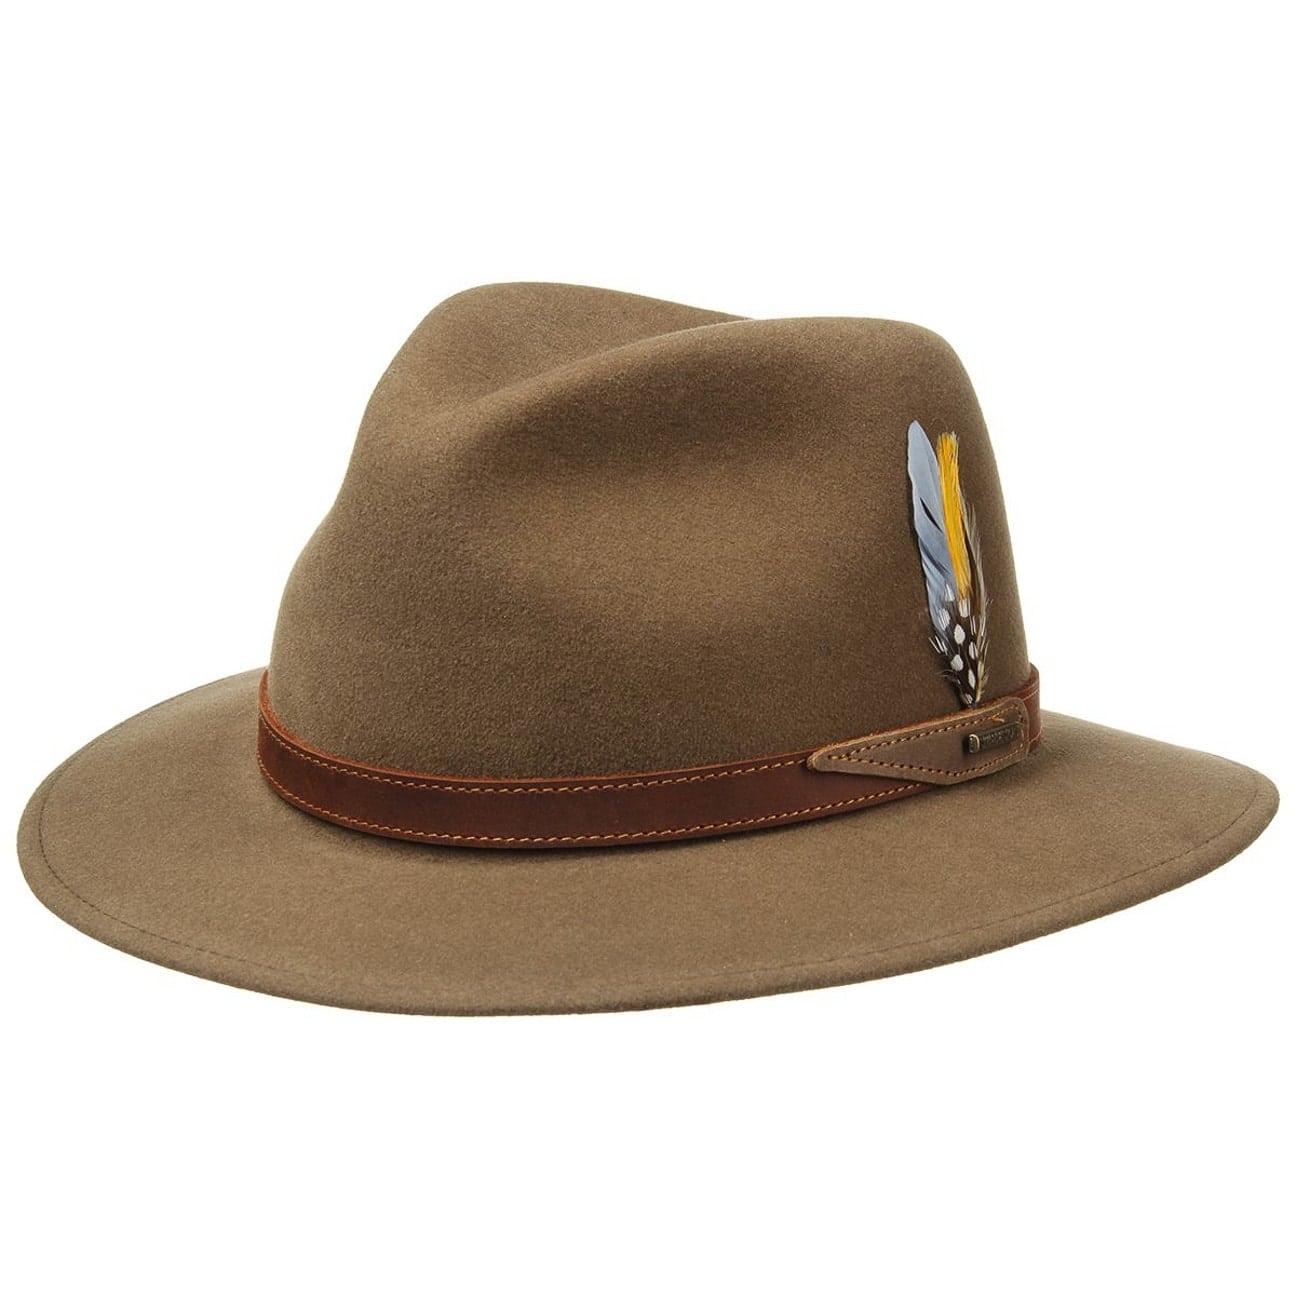 Women's Hats - Featured Styles